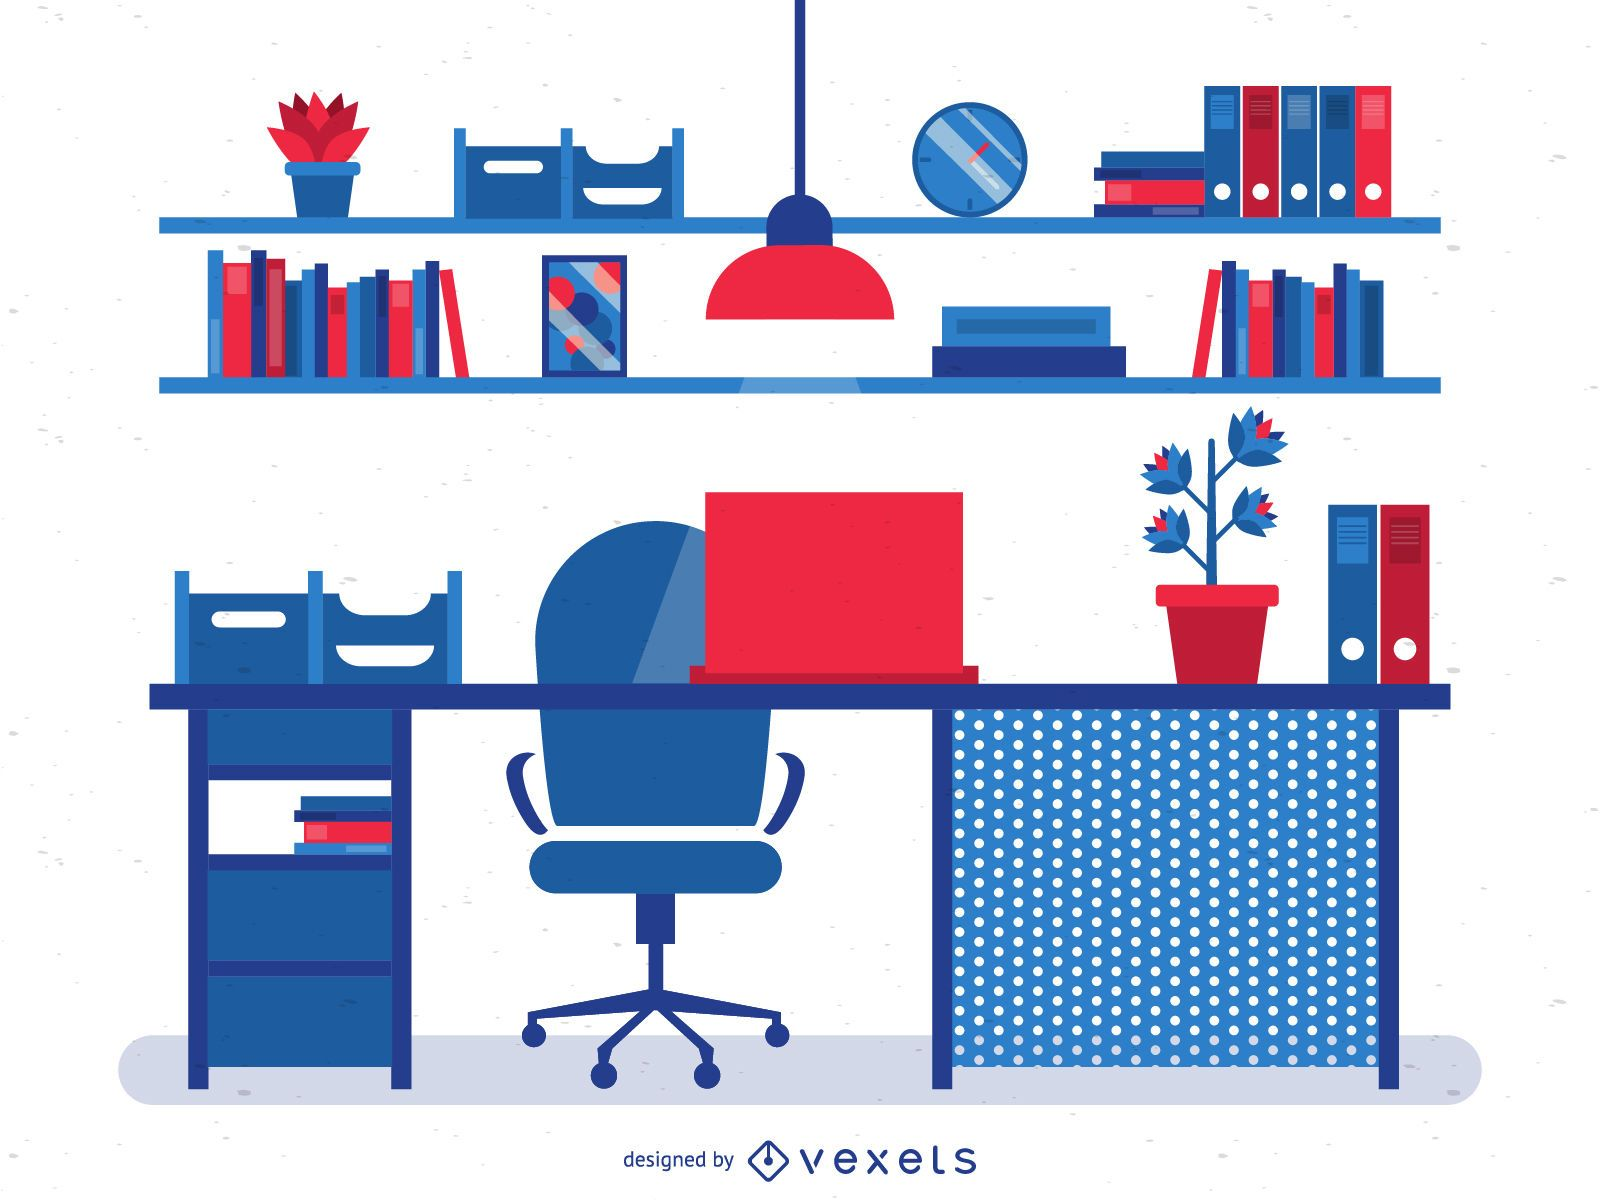 Red and blue flat office desk illustration